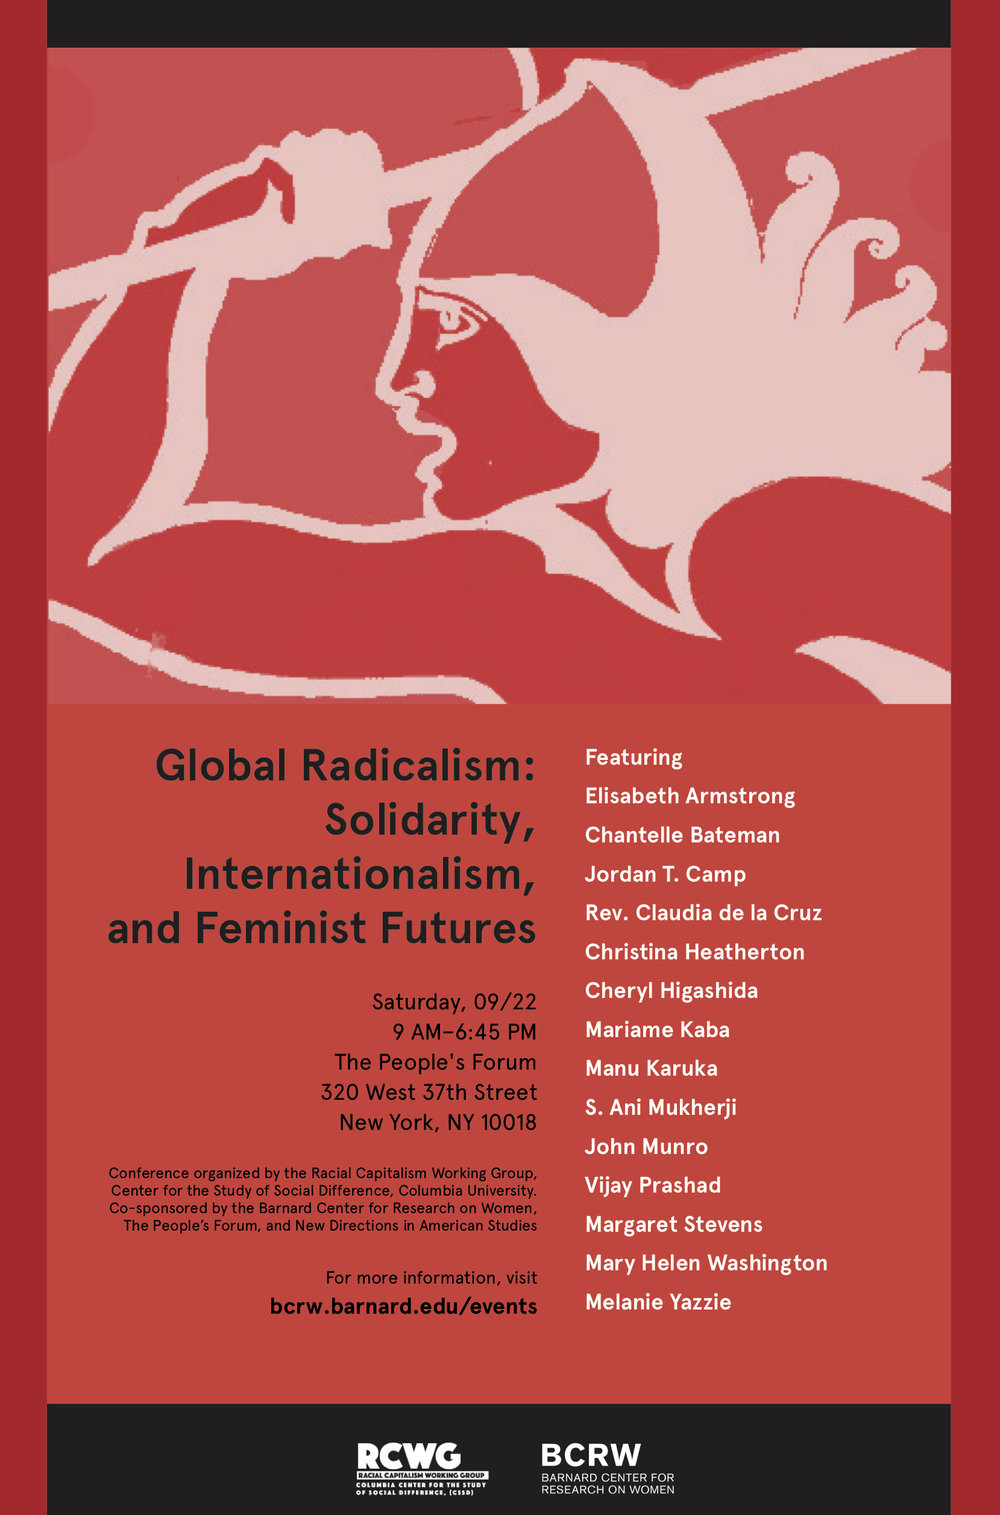 GlobalRadicalism-FINAL POSTER.jpg